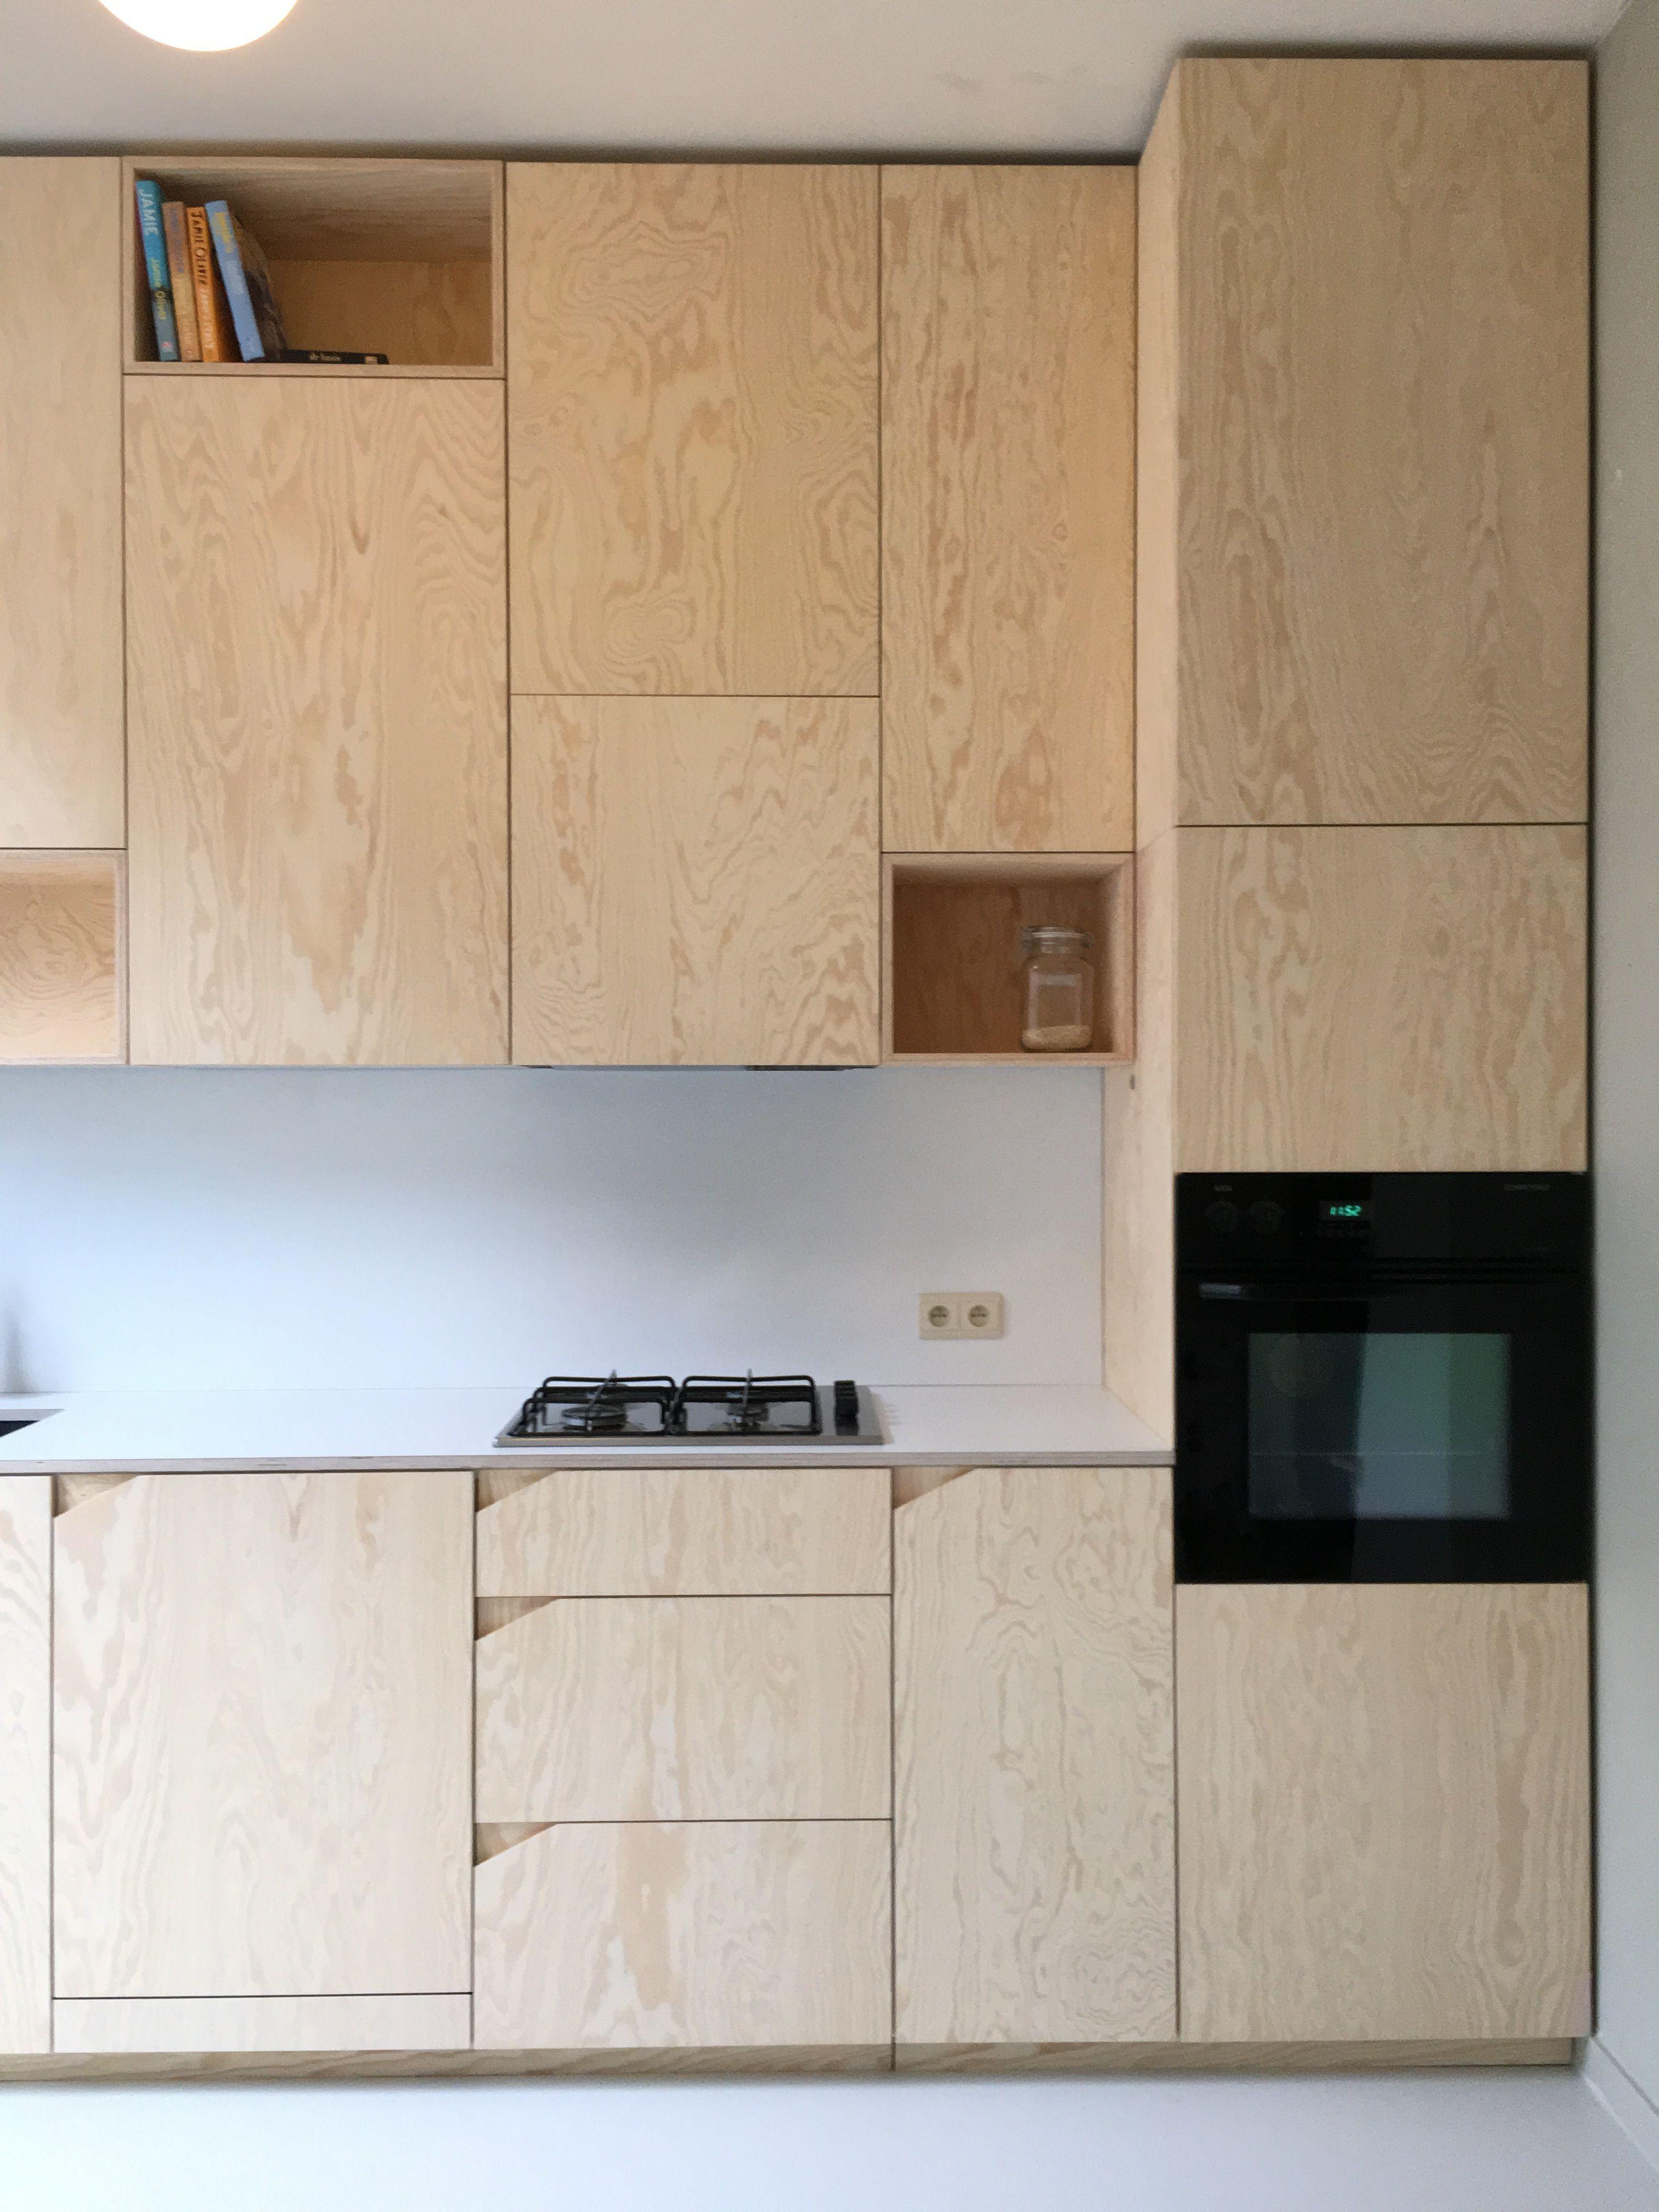 Küchendesign hong kong keuken tj asianminimalistdecor  asian minimalist decor in